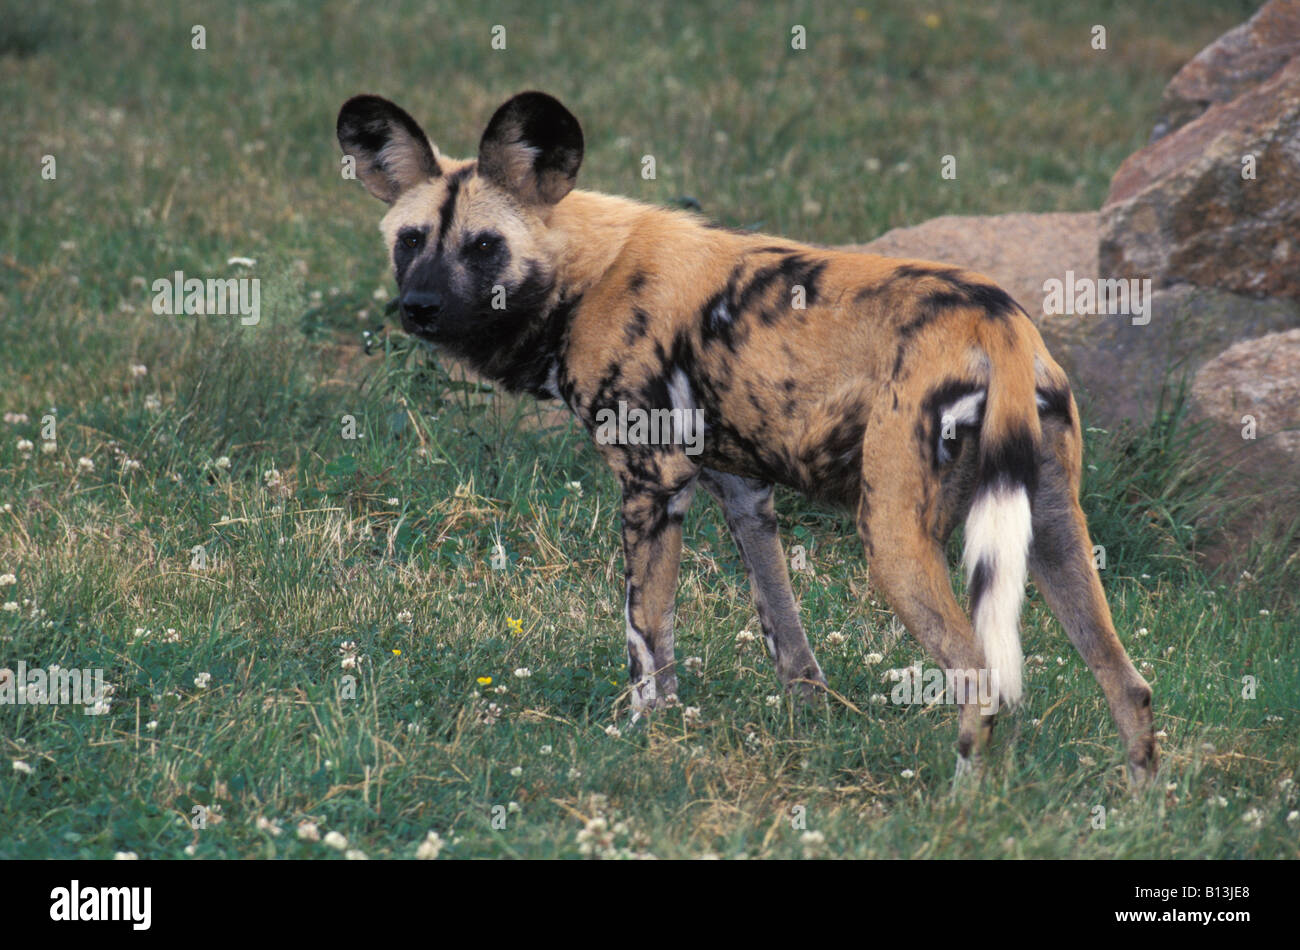 lycaon Afrikanischer Wildhund Hyaenenhund African Hunting Dog Lycaon pictus African Wild Dog side adult Africa animal - Stock Image